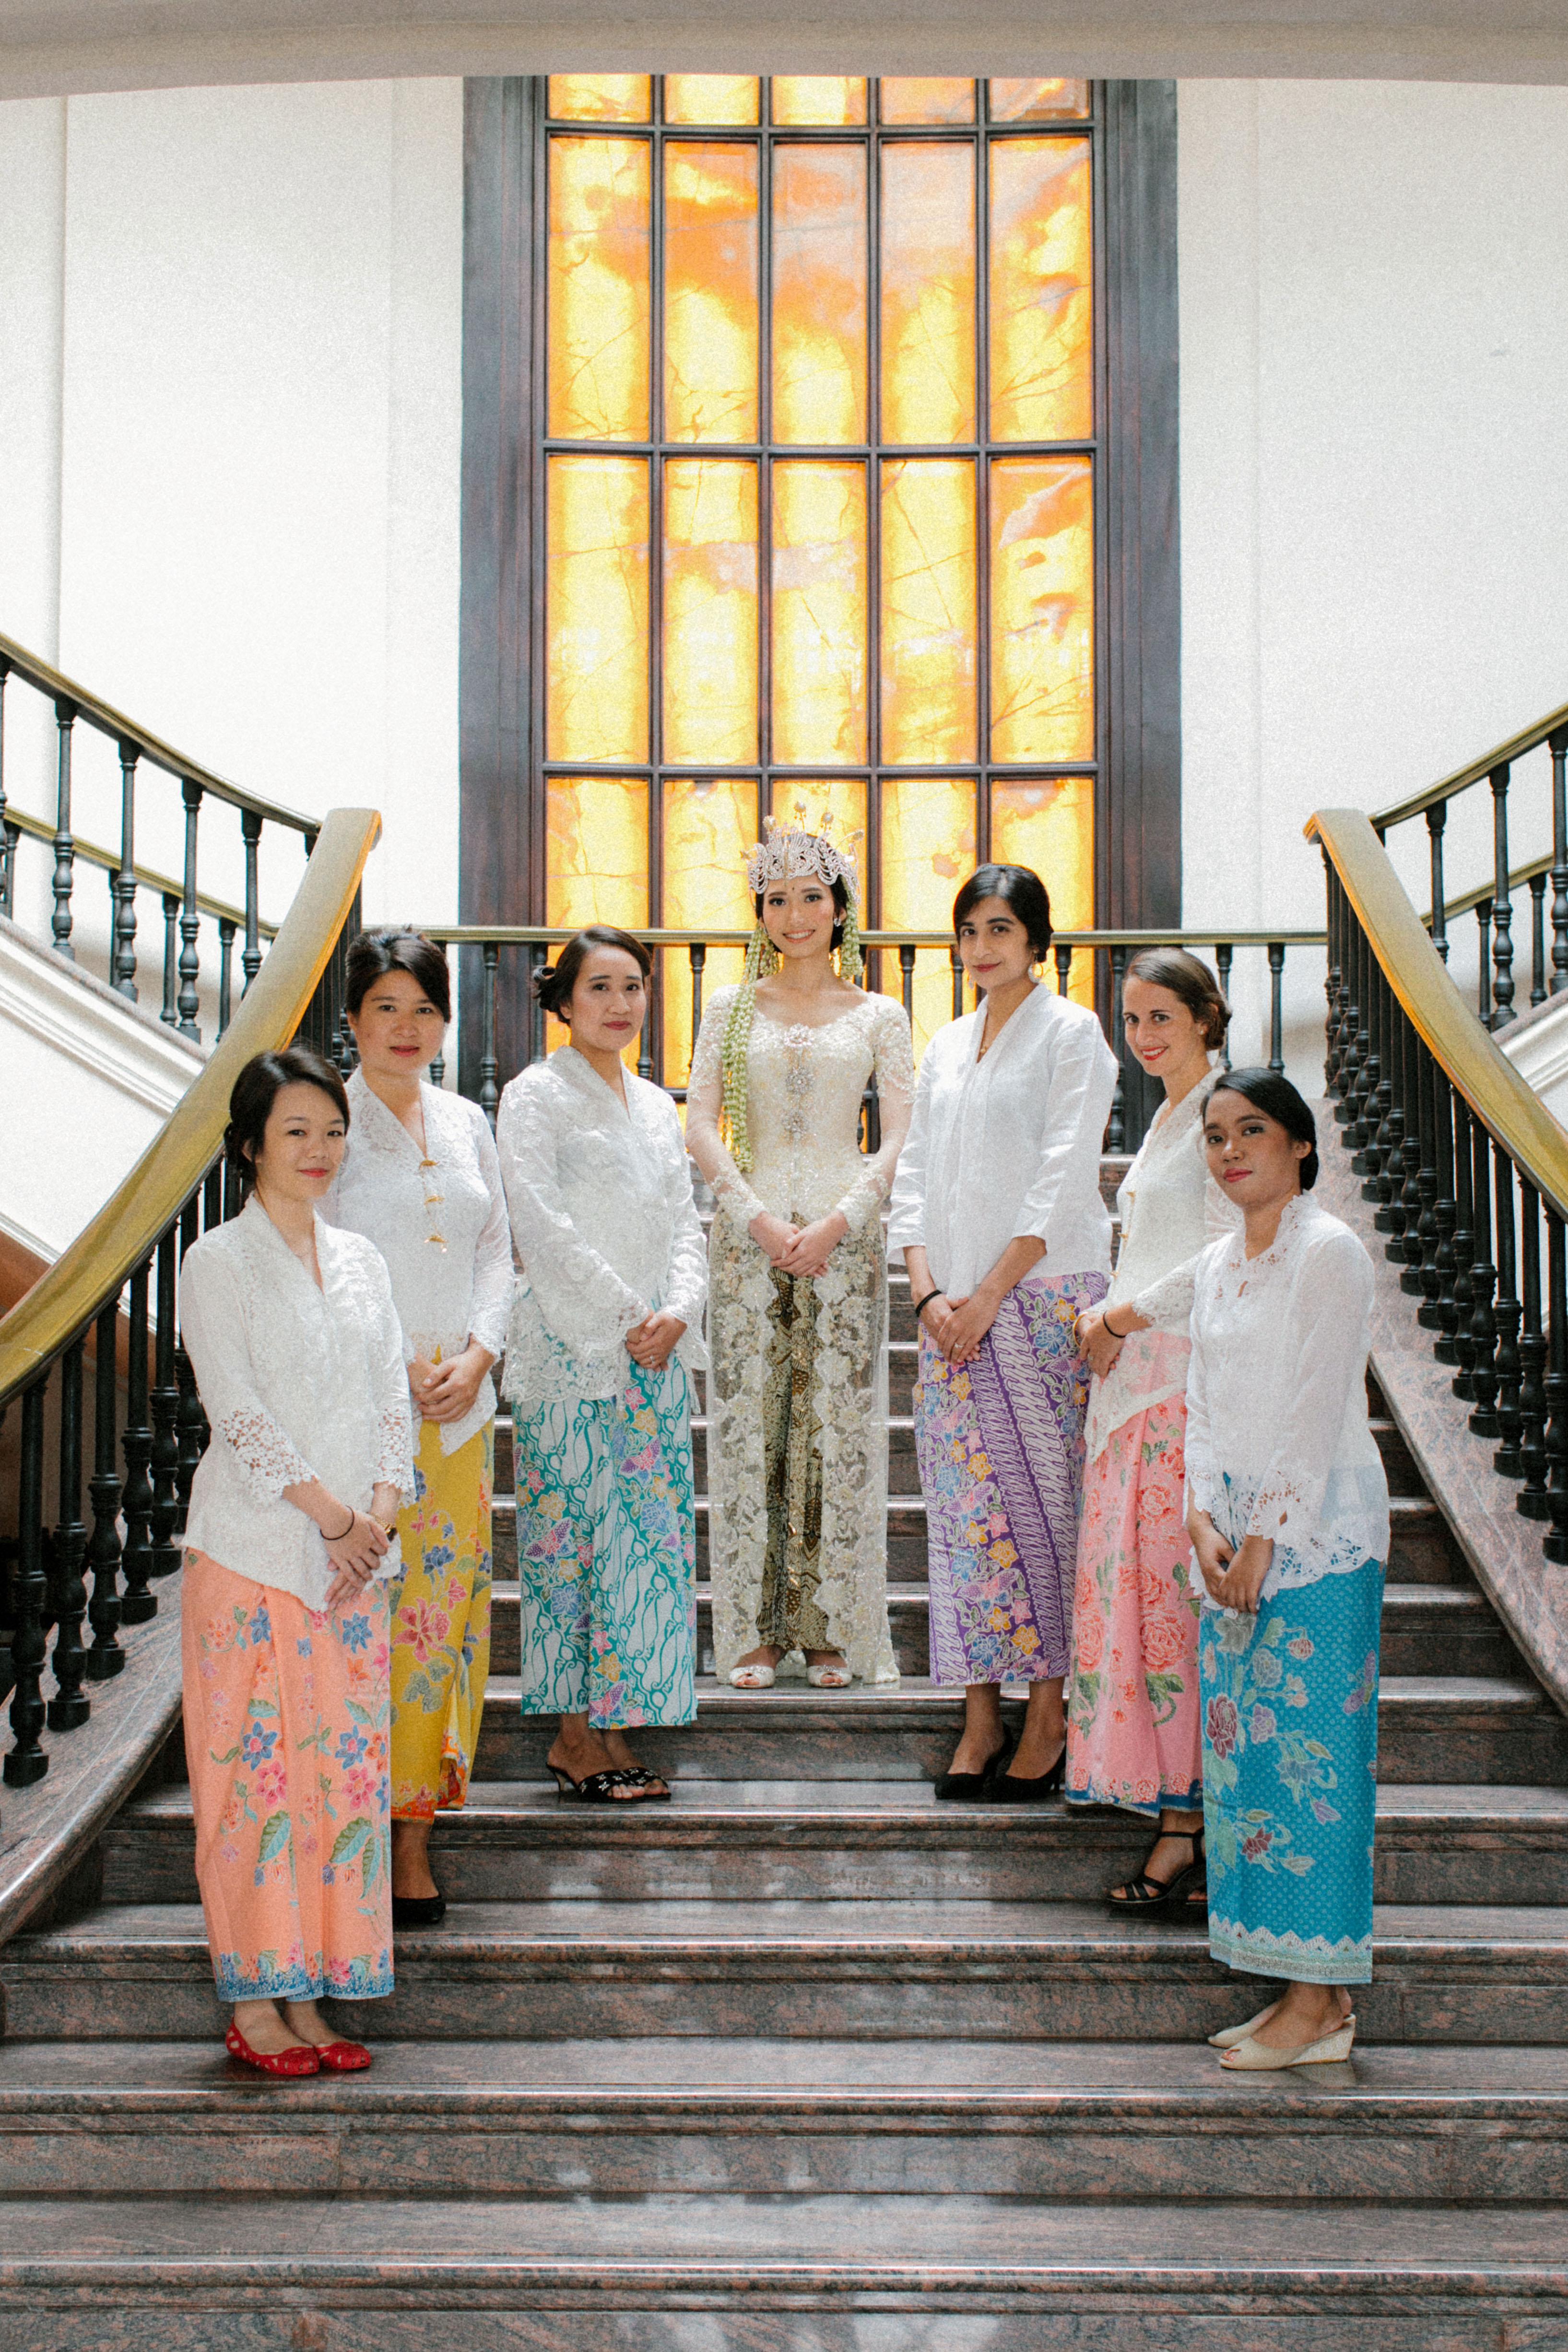 wedding bride bridesmaid group pose on stairway